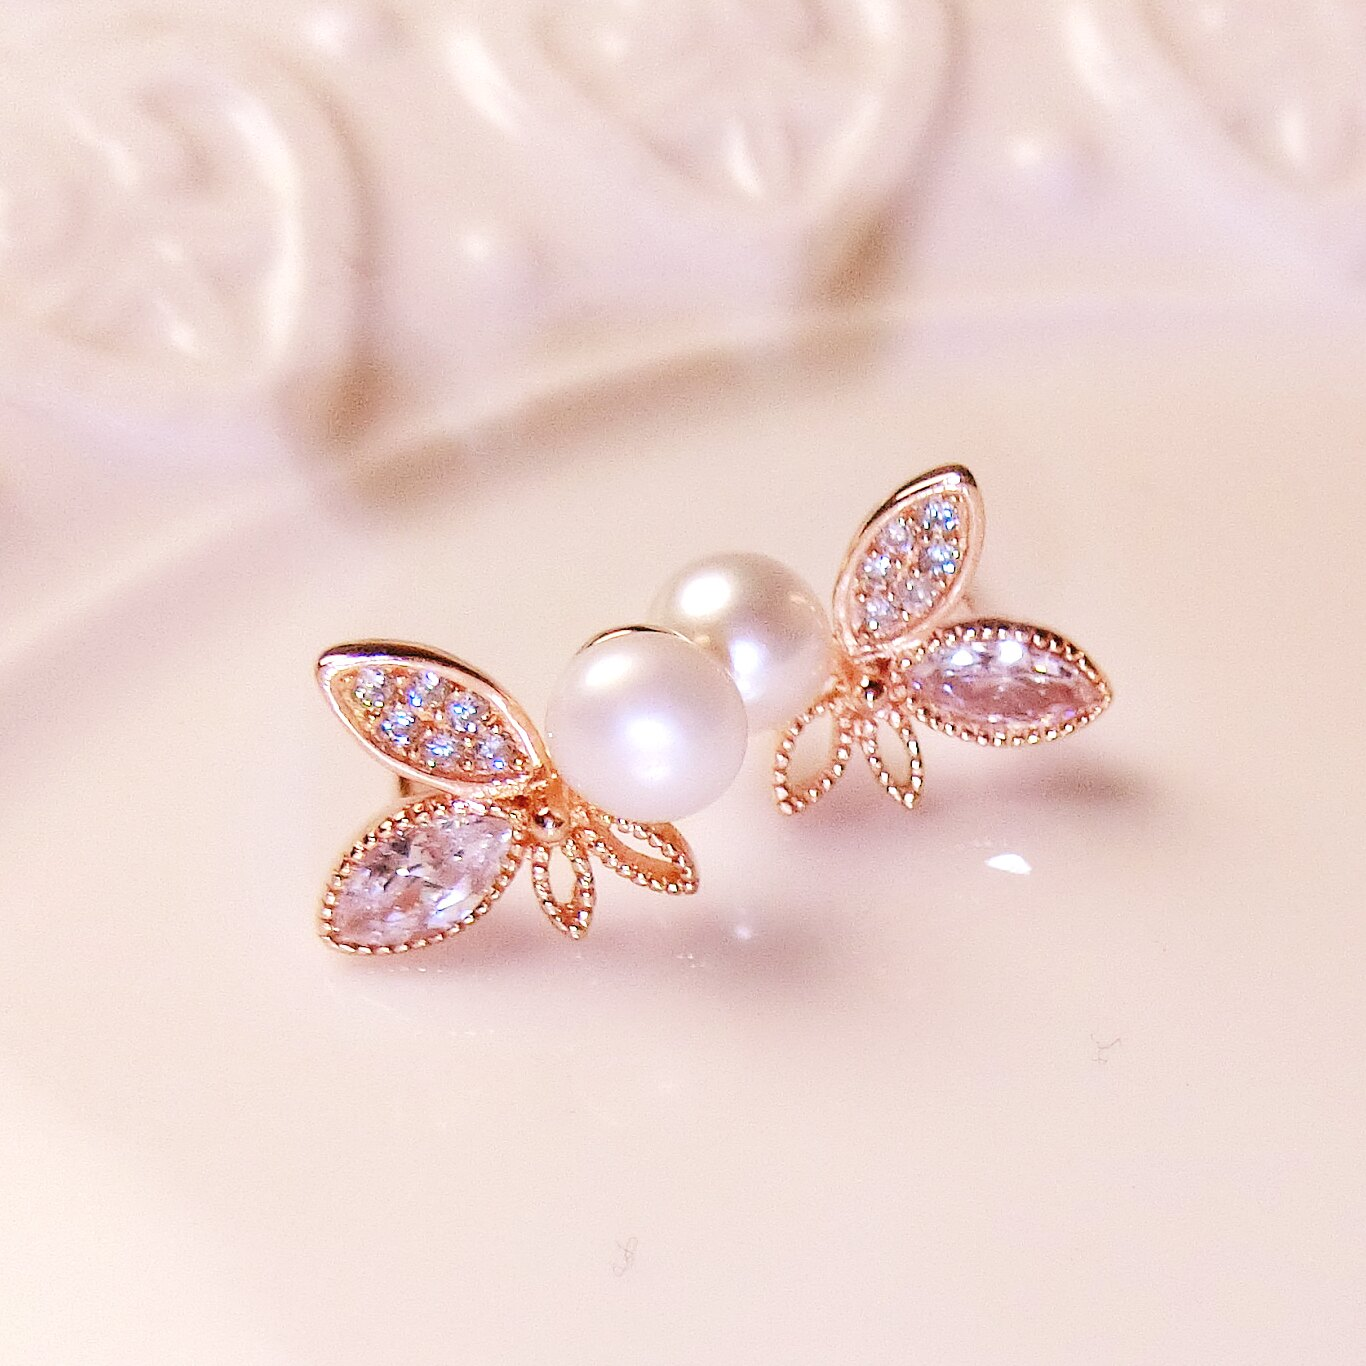 Tokyo Alice 925純銀珍珠葉子耳環^(玫瑰金色^),貝珠純銀飾品首飾耳飾貼耳針